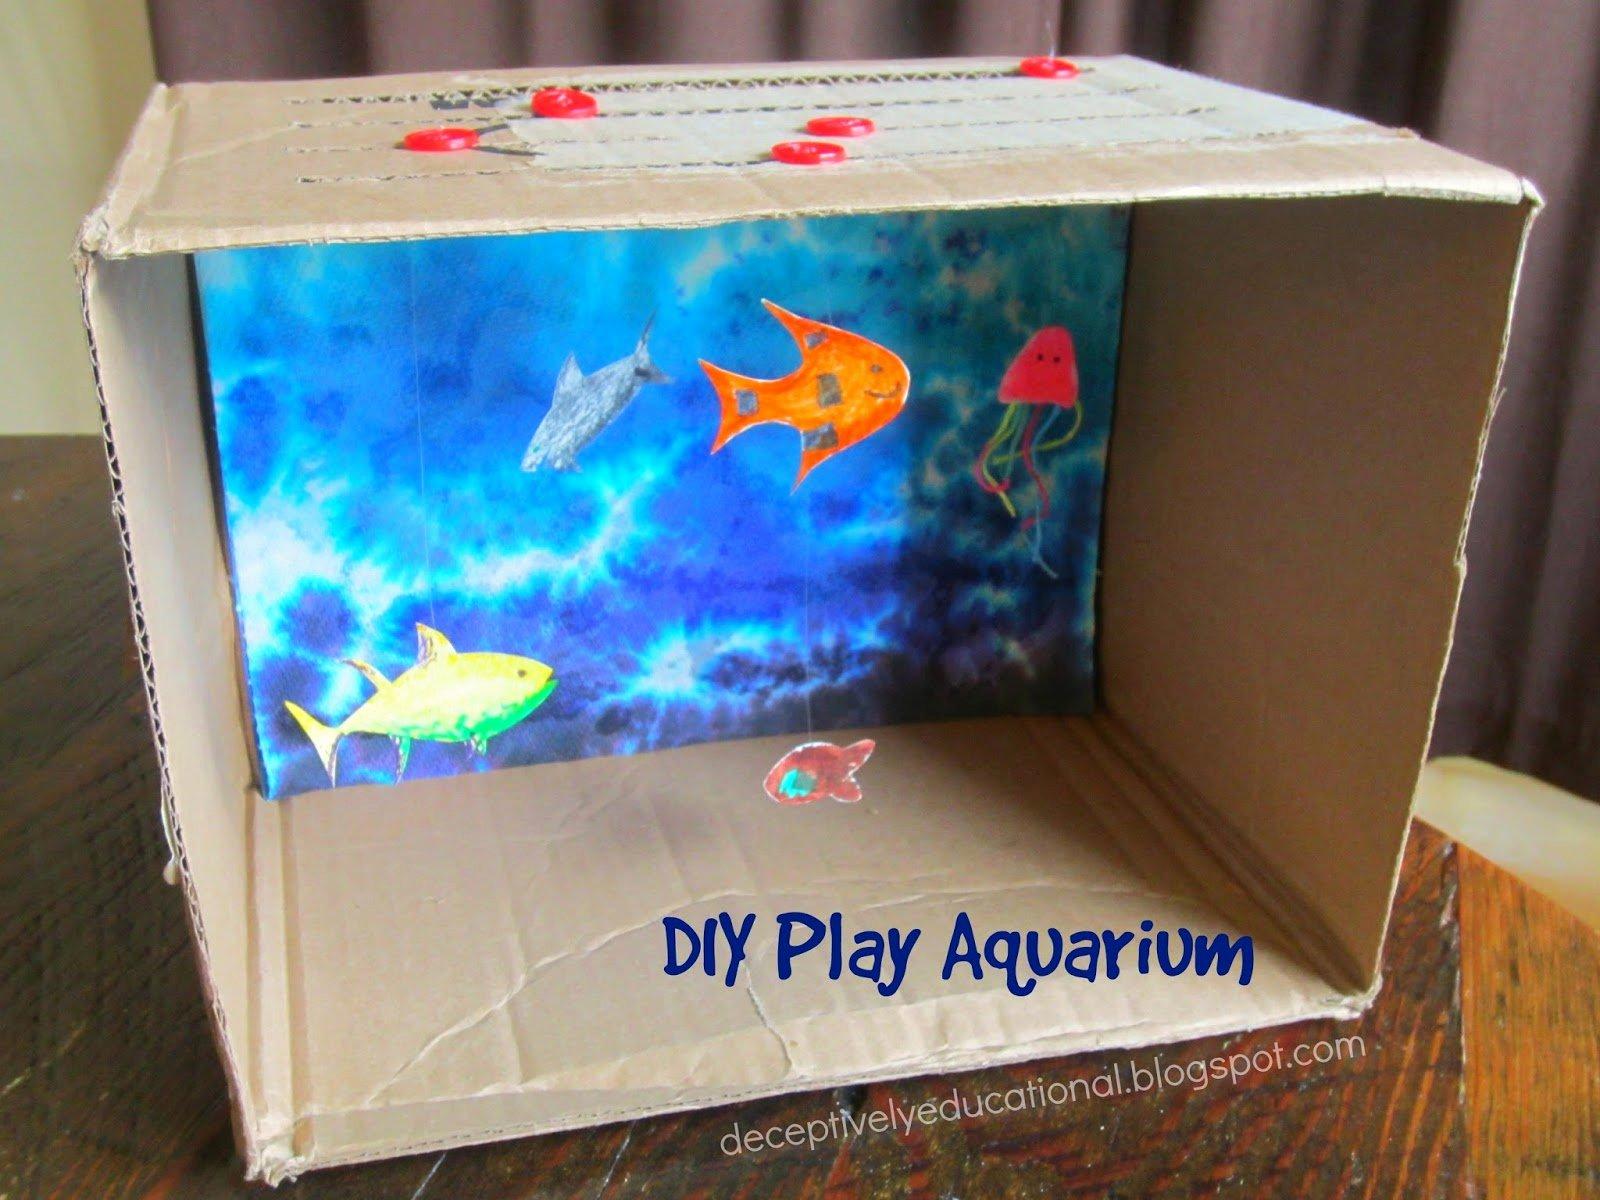 Diy Aquarium Background Paper Best Of Relentlessly Fun Deceptively Educational Diy Play Aquarium